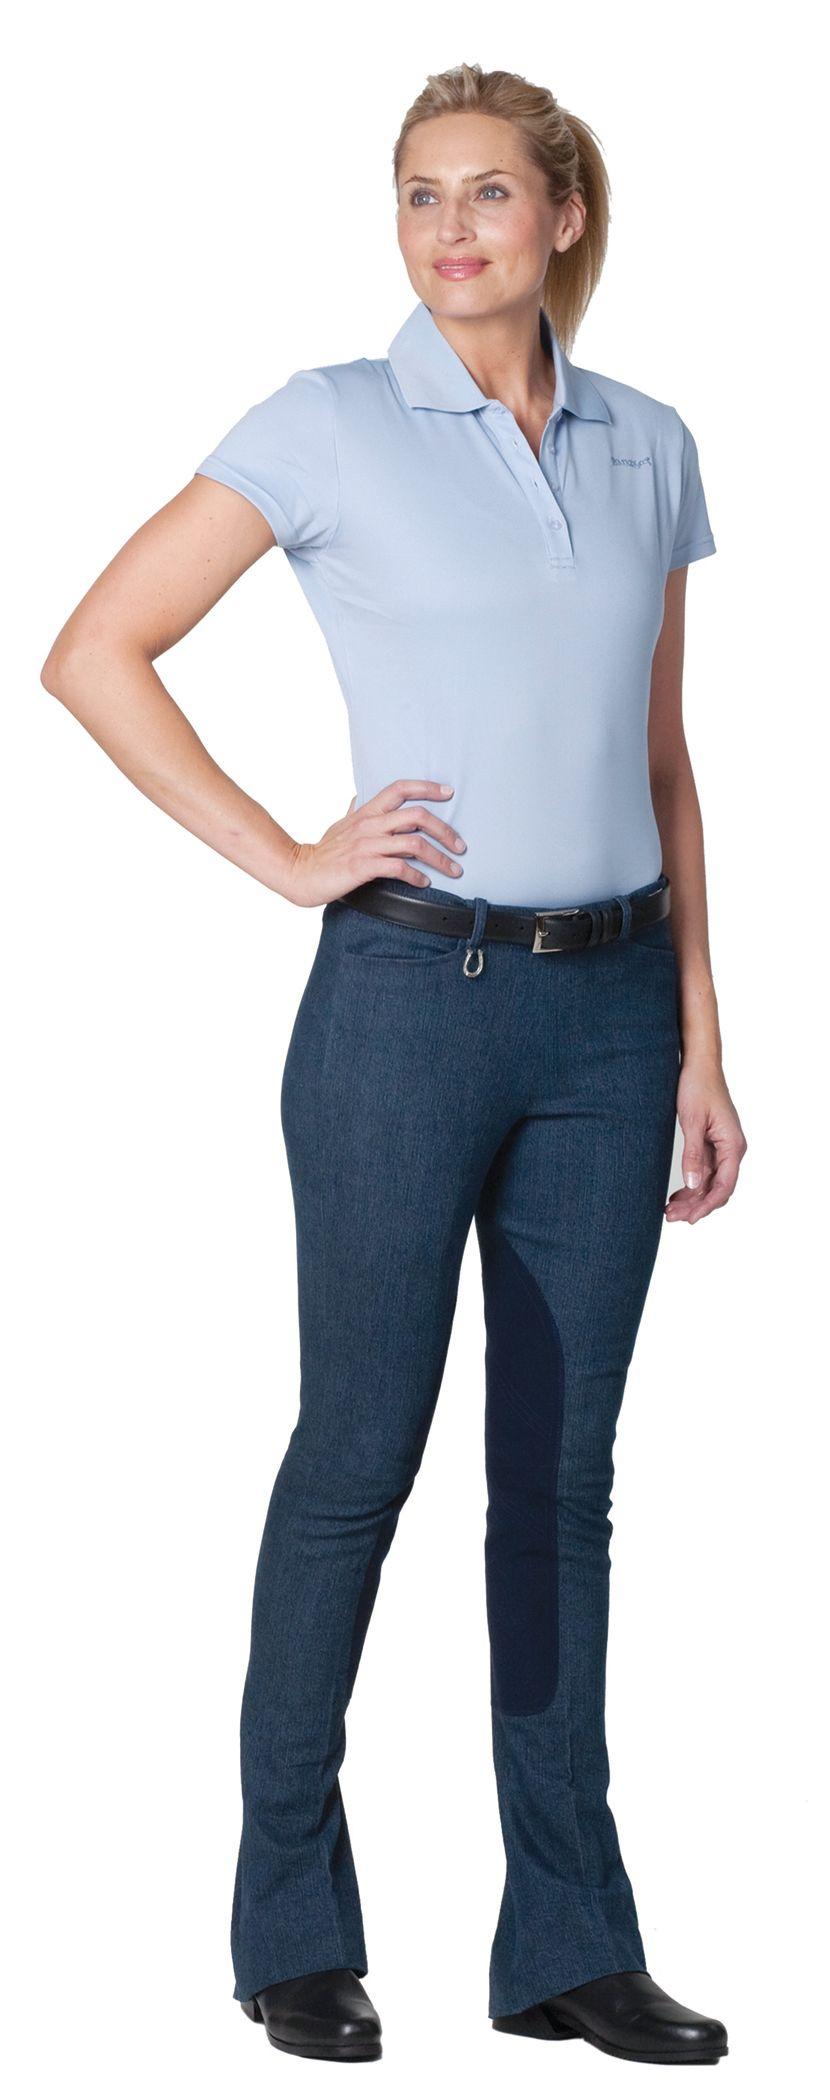 Ovation Ladies Side Zip Lucky Brand Denim KY Jodhpurs